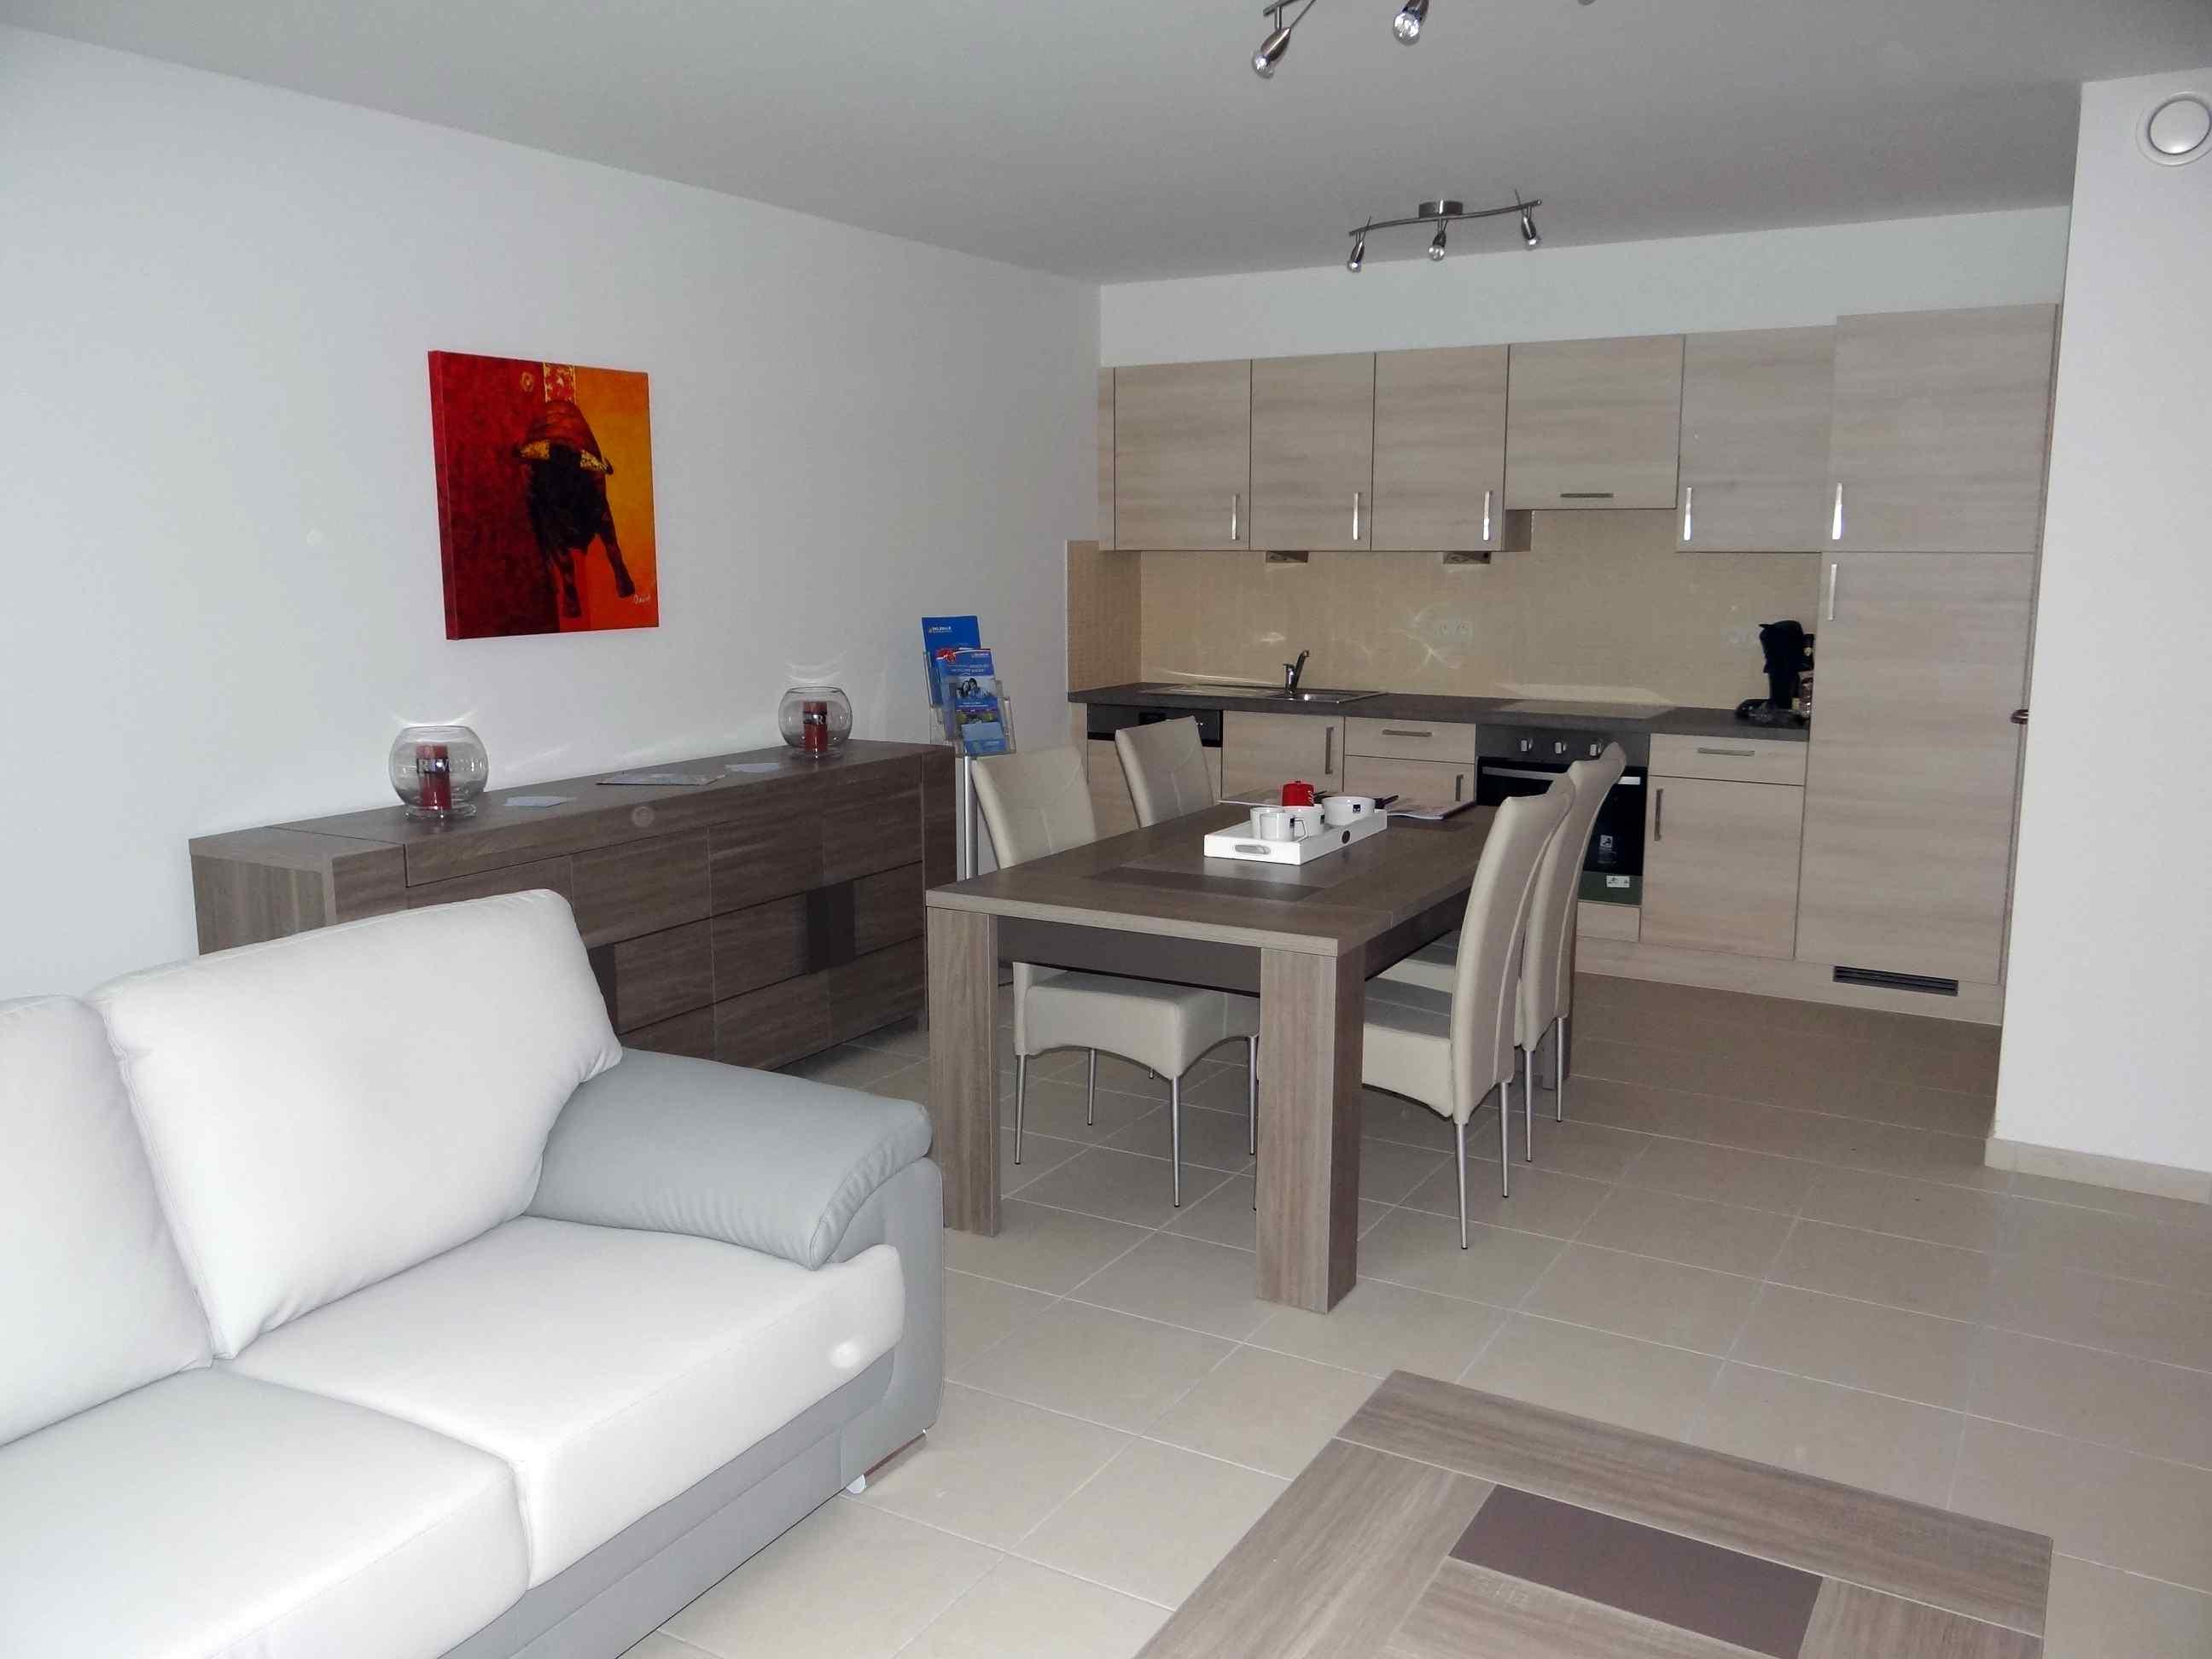 Bel Appartement Louer Mons Verdoyant Calme Immo